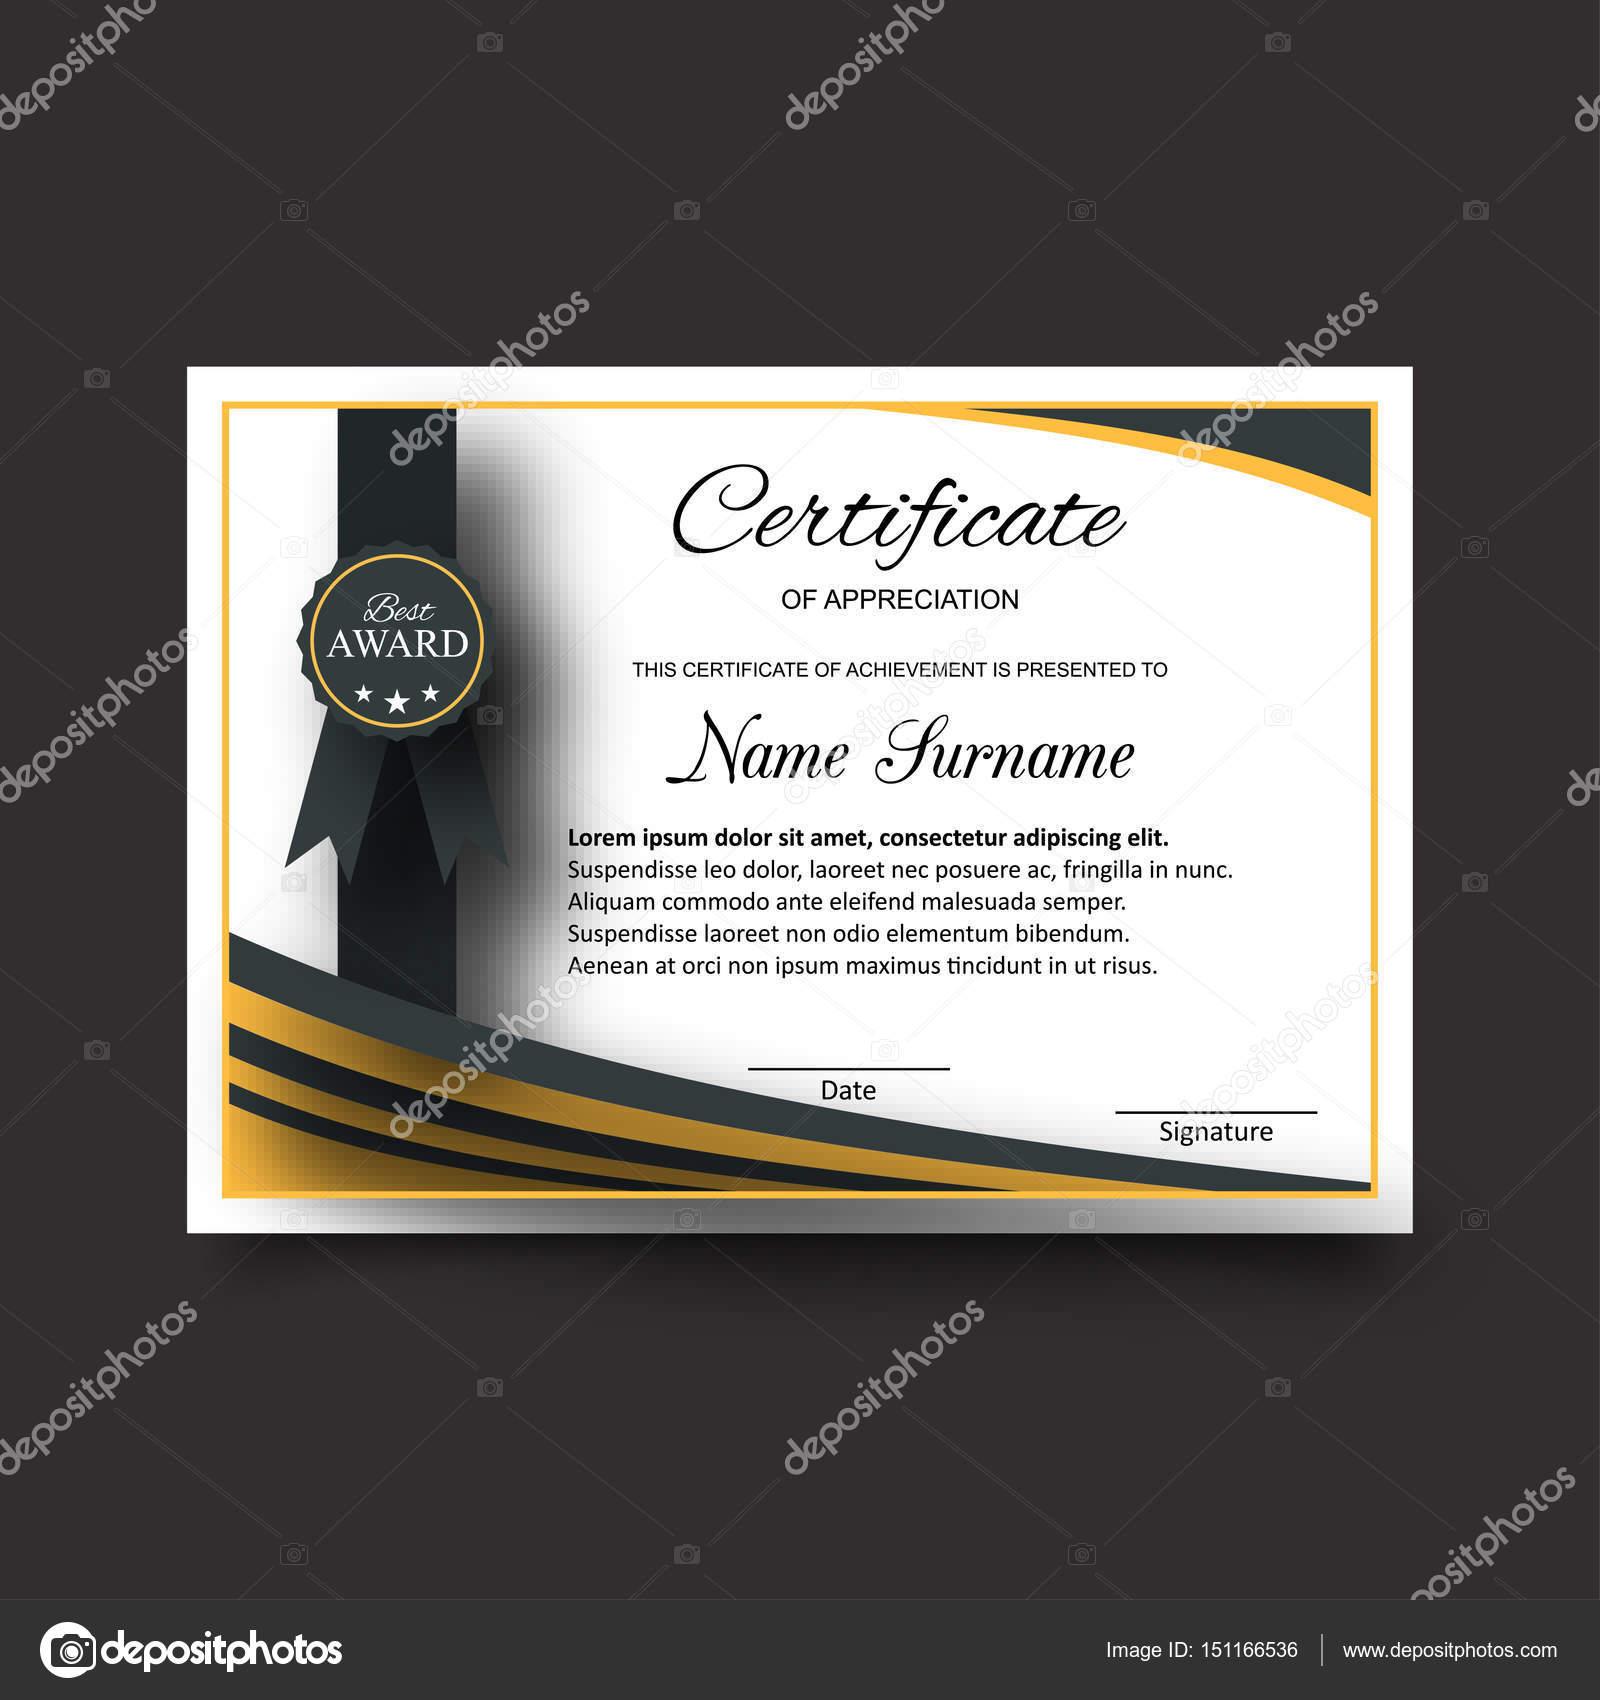 Business-Zertifikat-Vorlage — Stockvektor © ibrandify #151166536